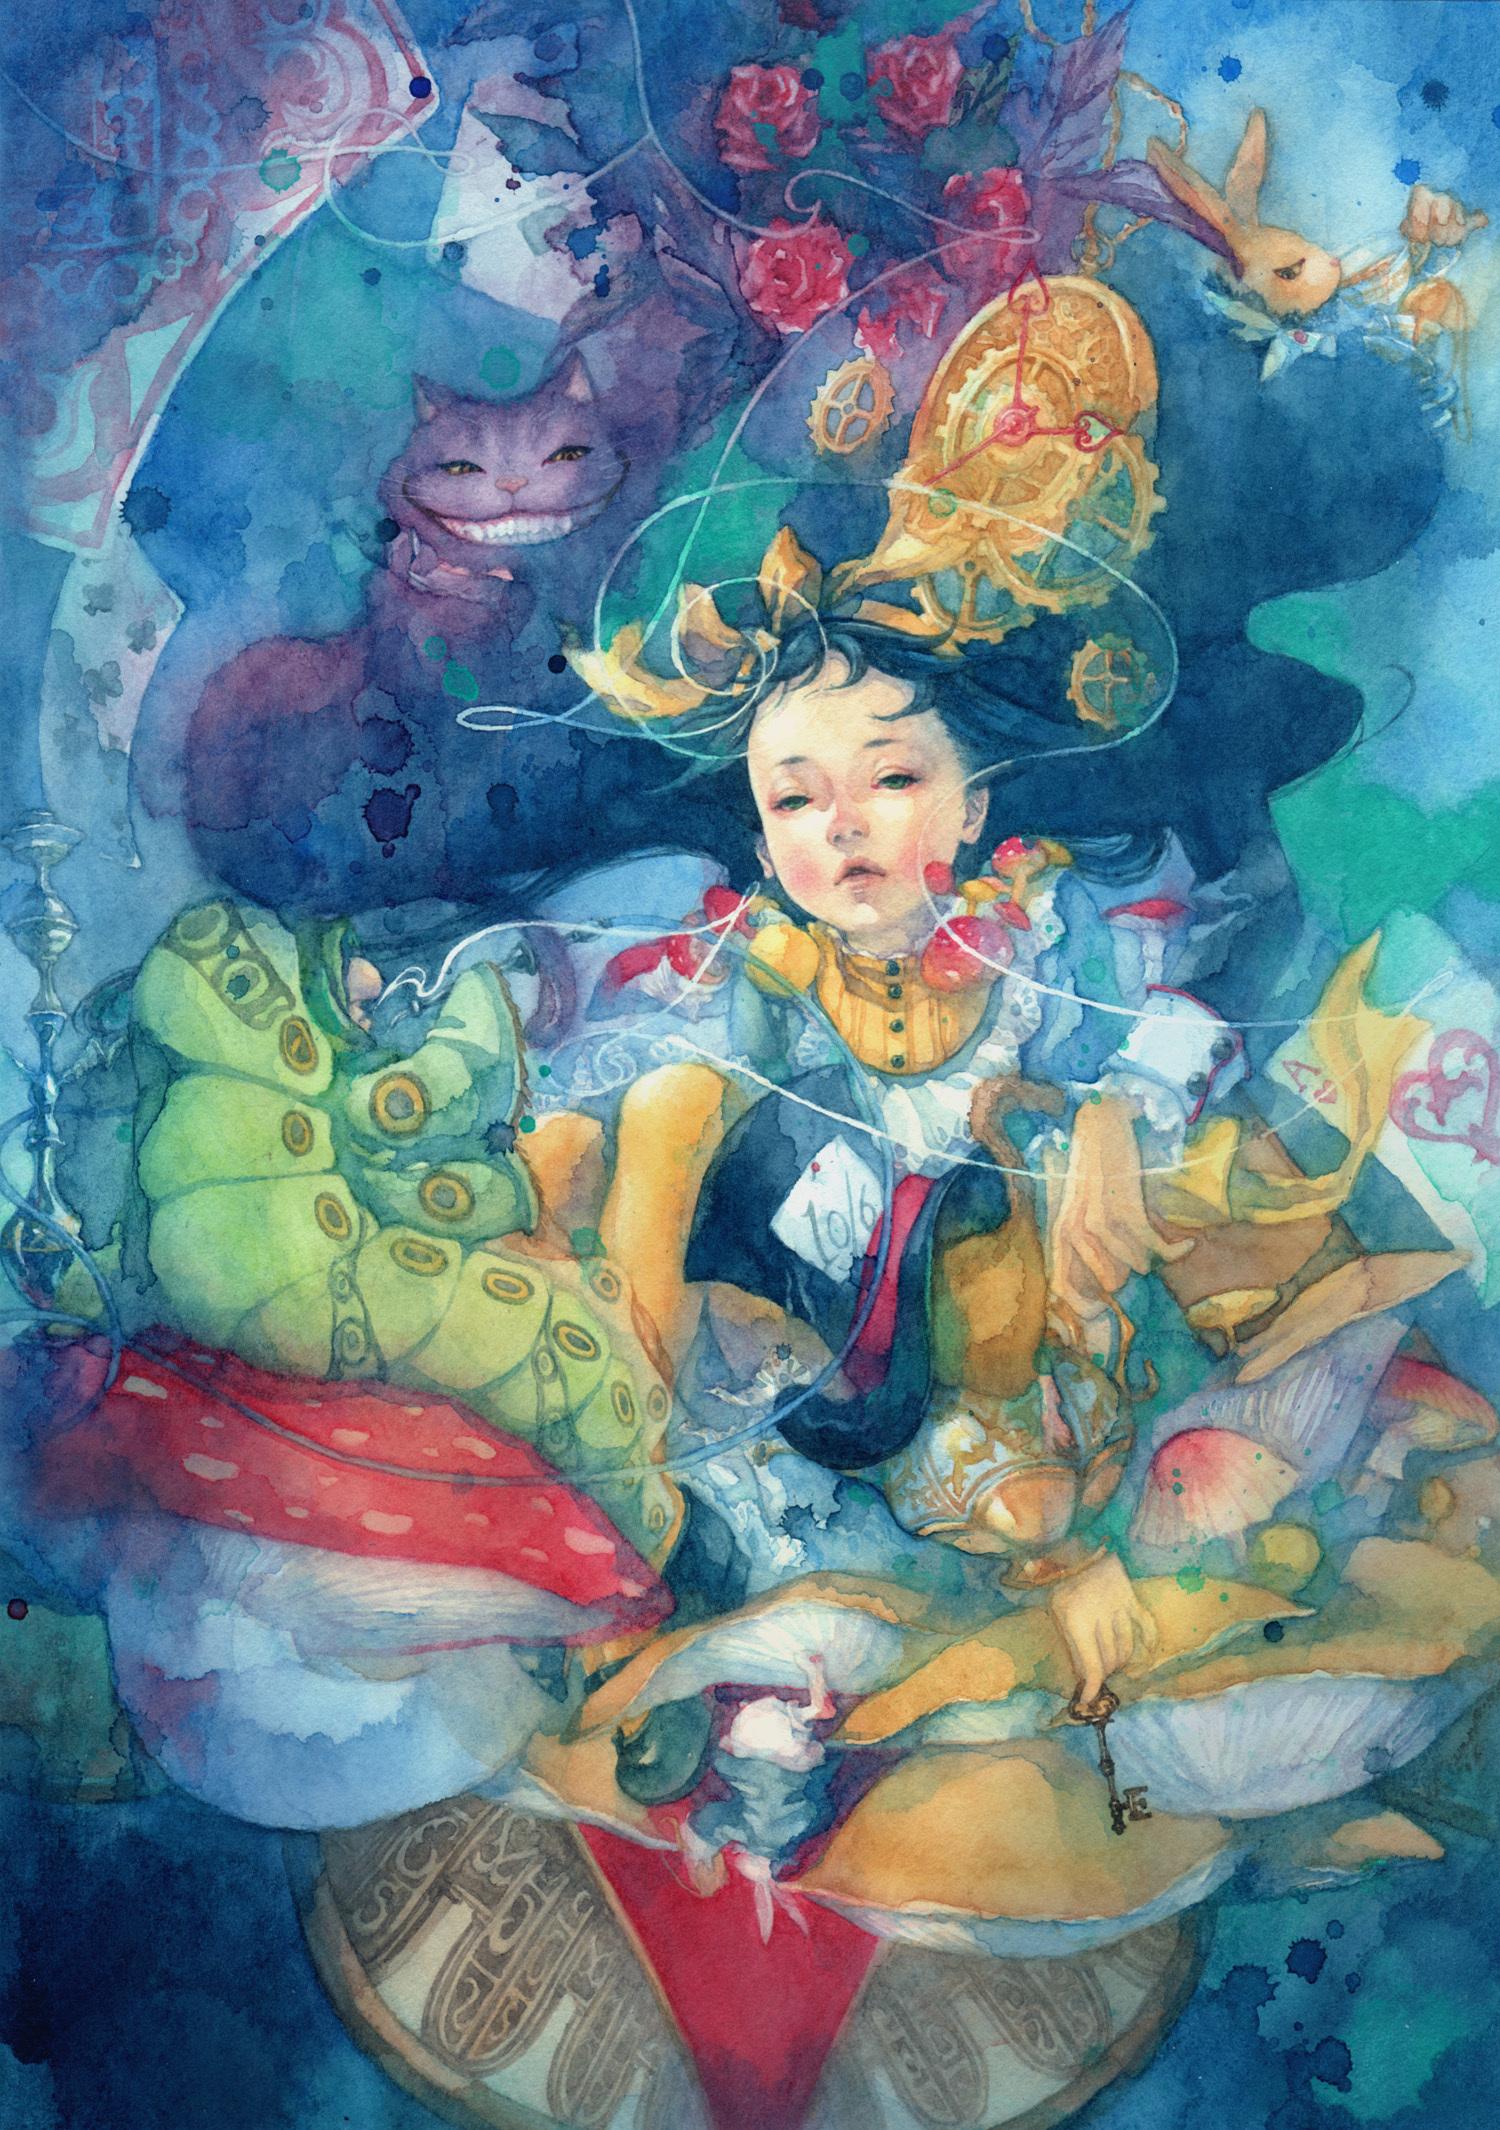 Alice In Wonderland Mobile Wallpaper 299617 Zerochan Anime